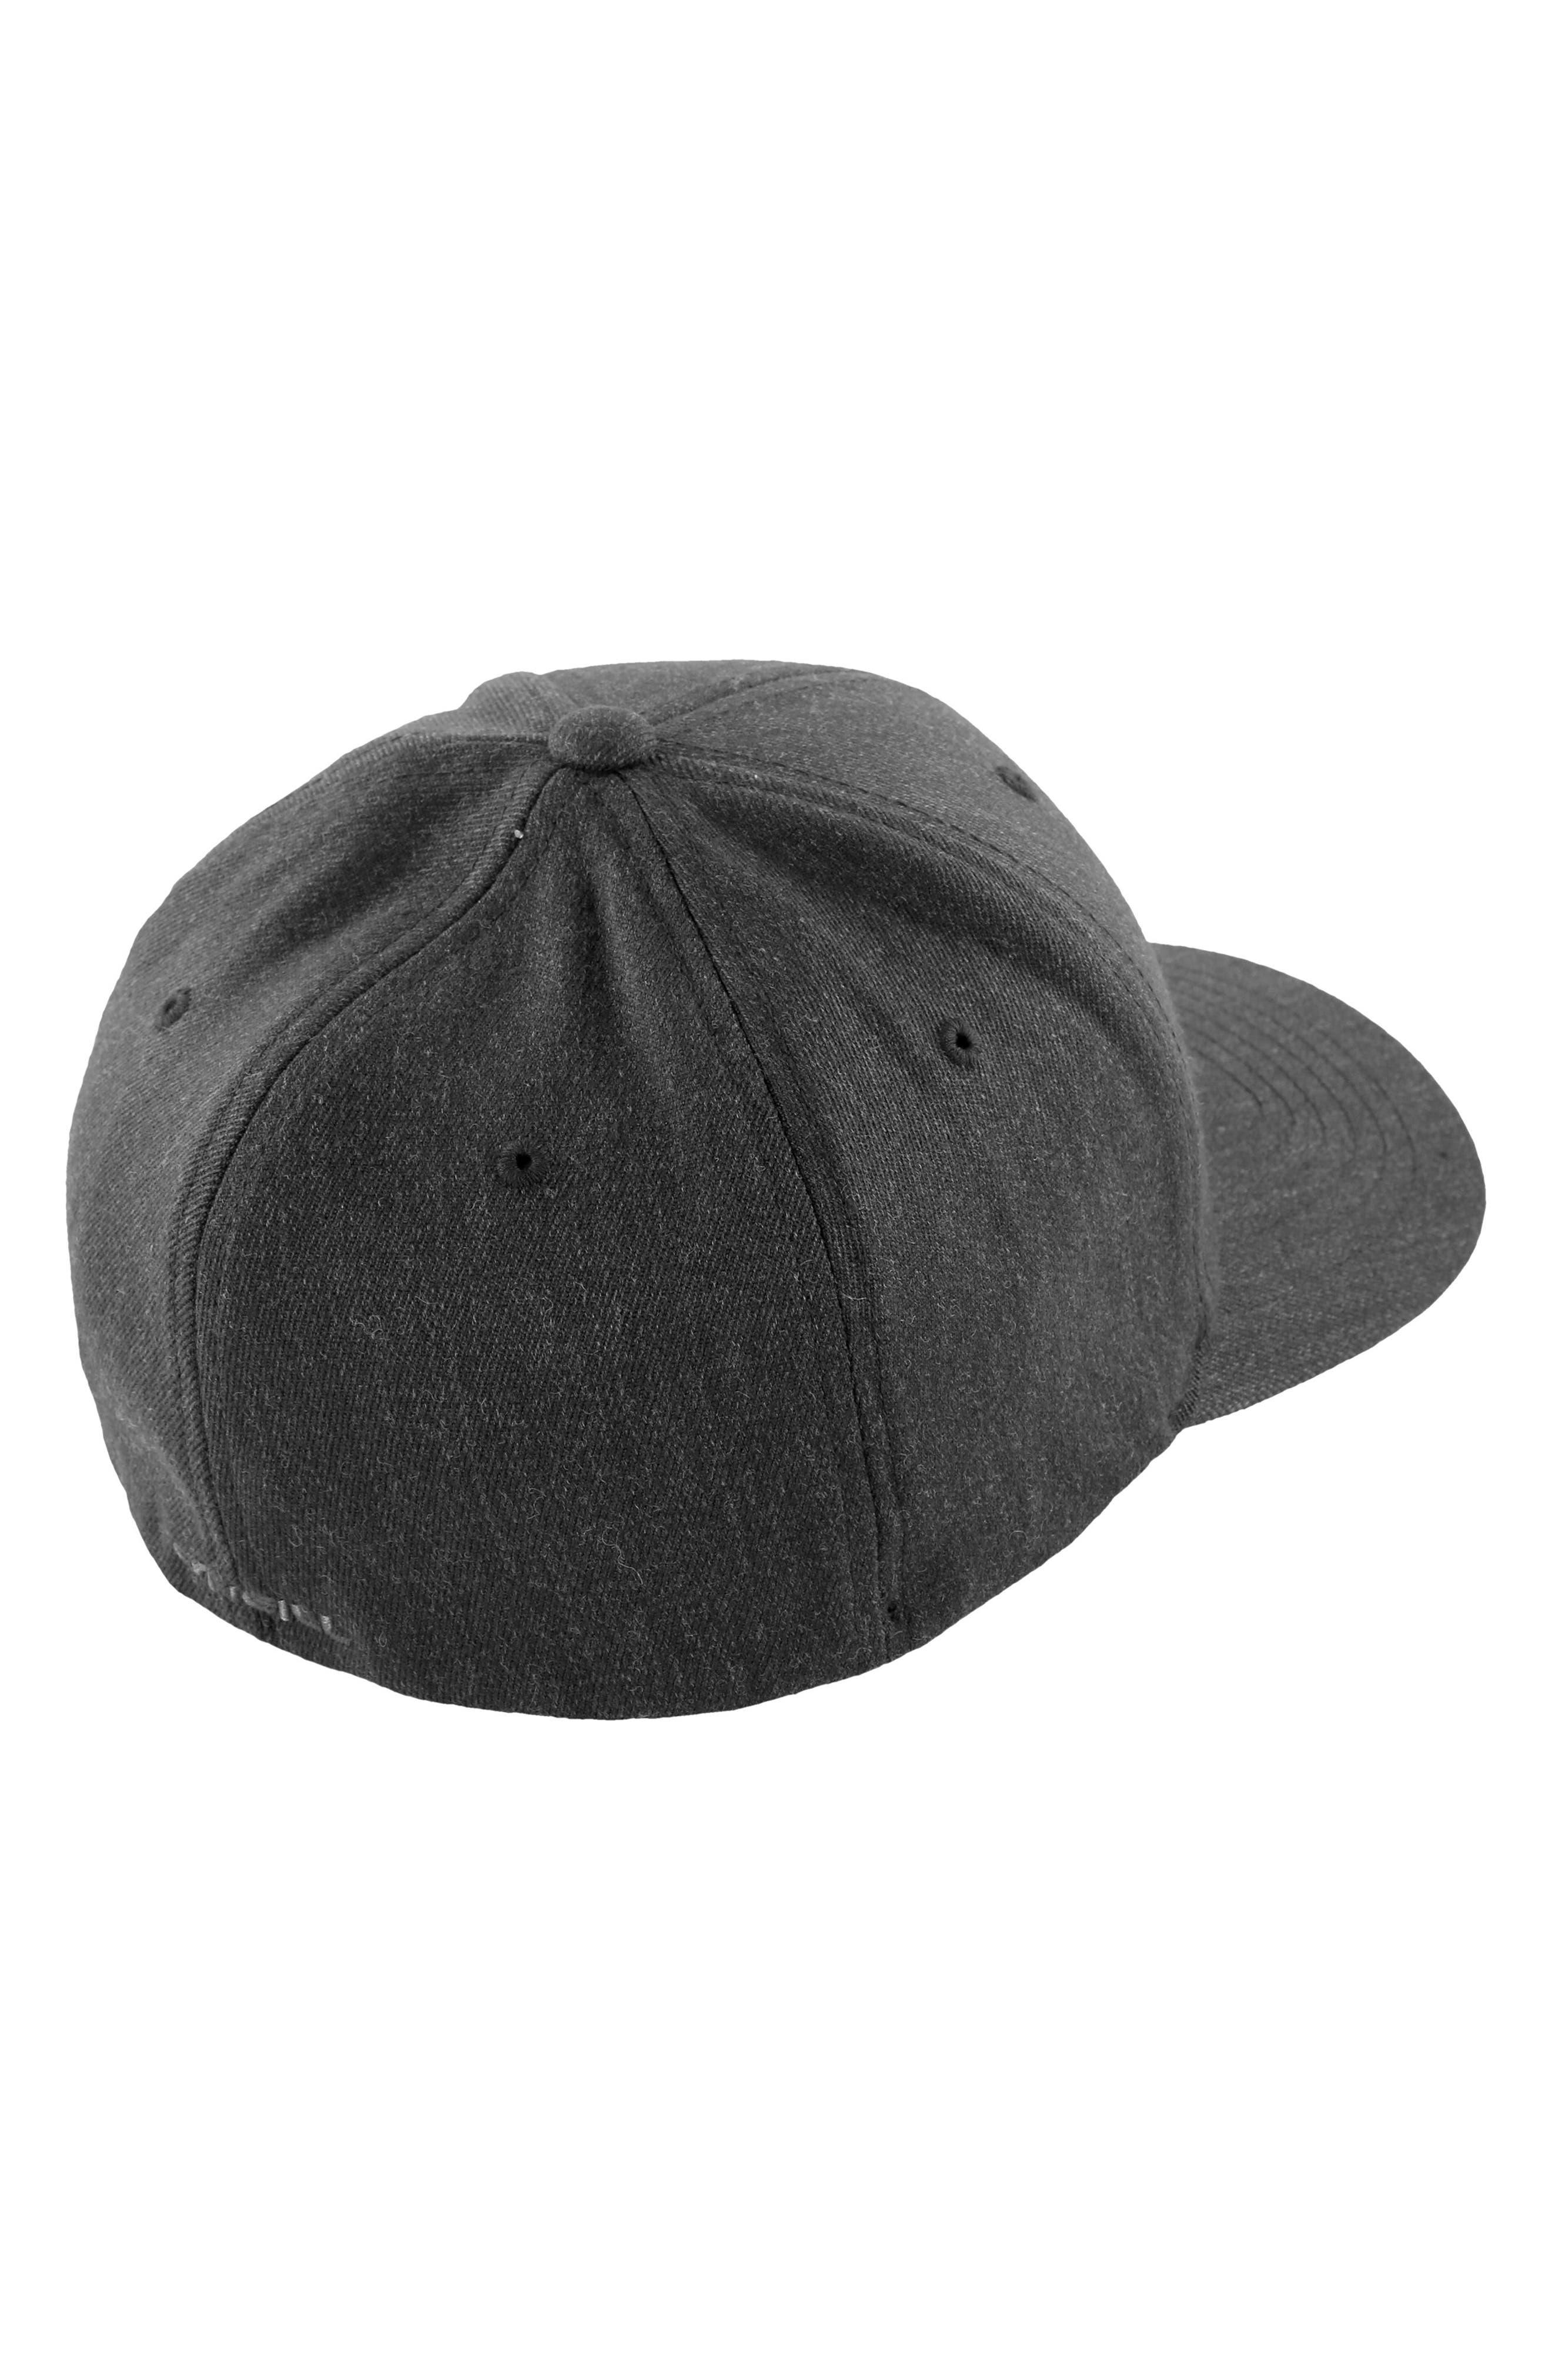 Lodown Ball Cap,                             Alternate thumbnail 2, color,                             010